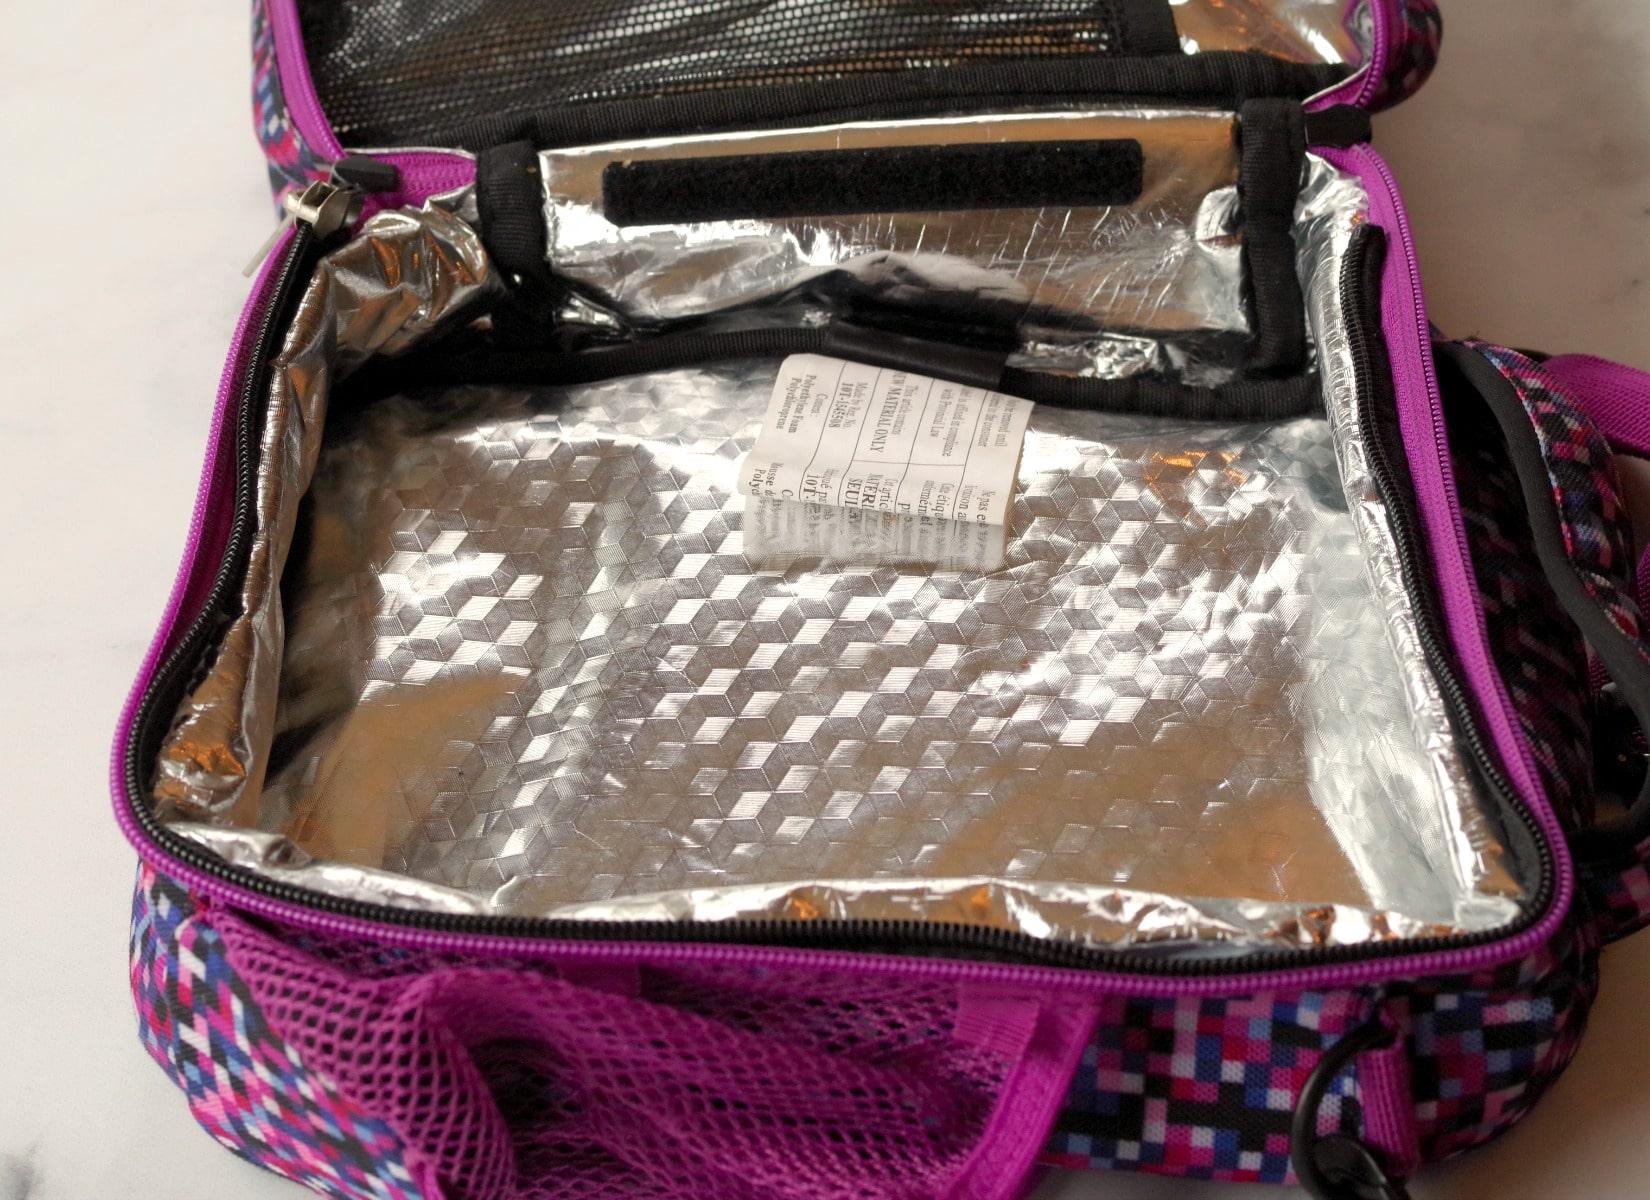 inside of an empty lunch box